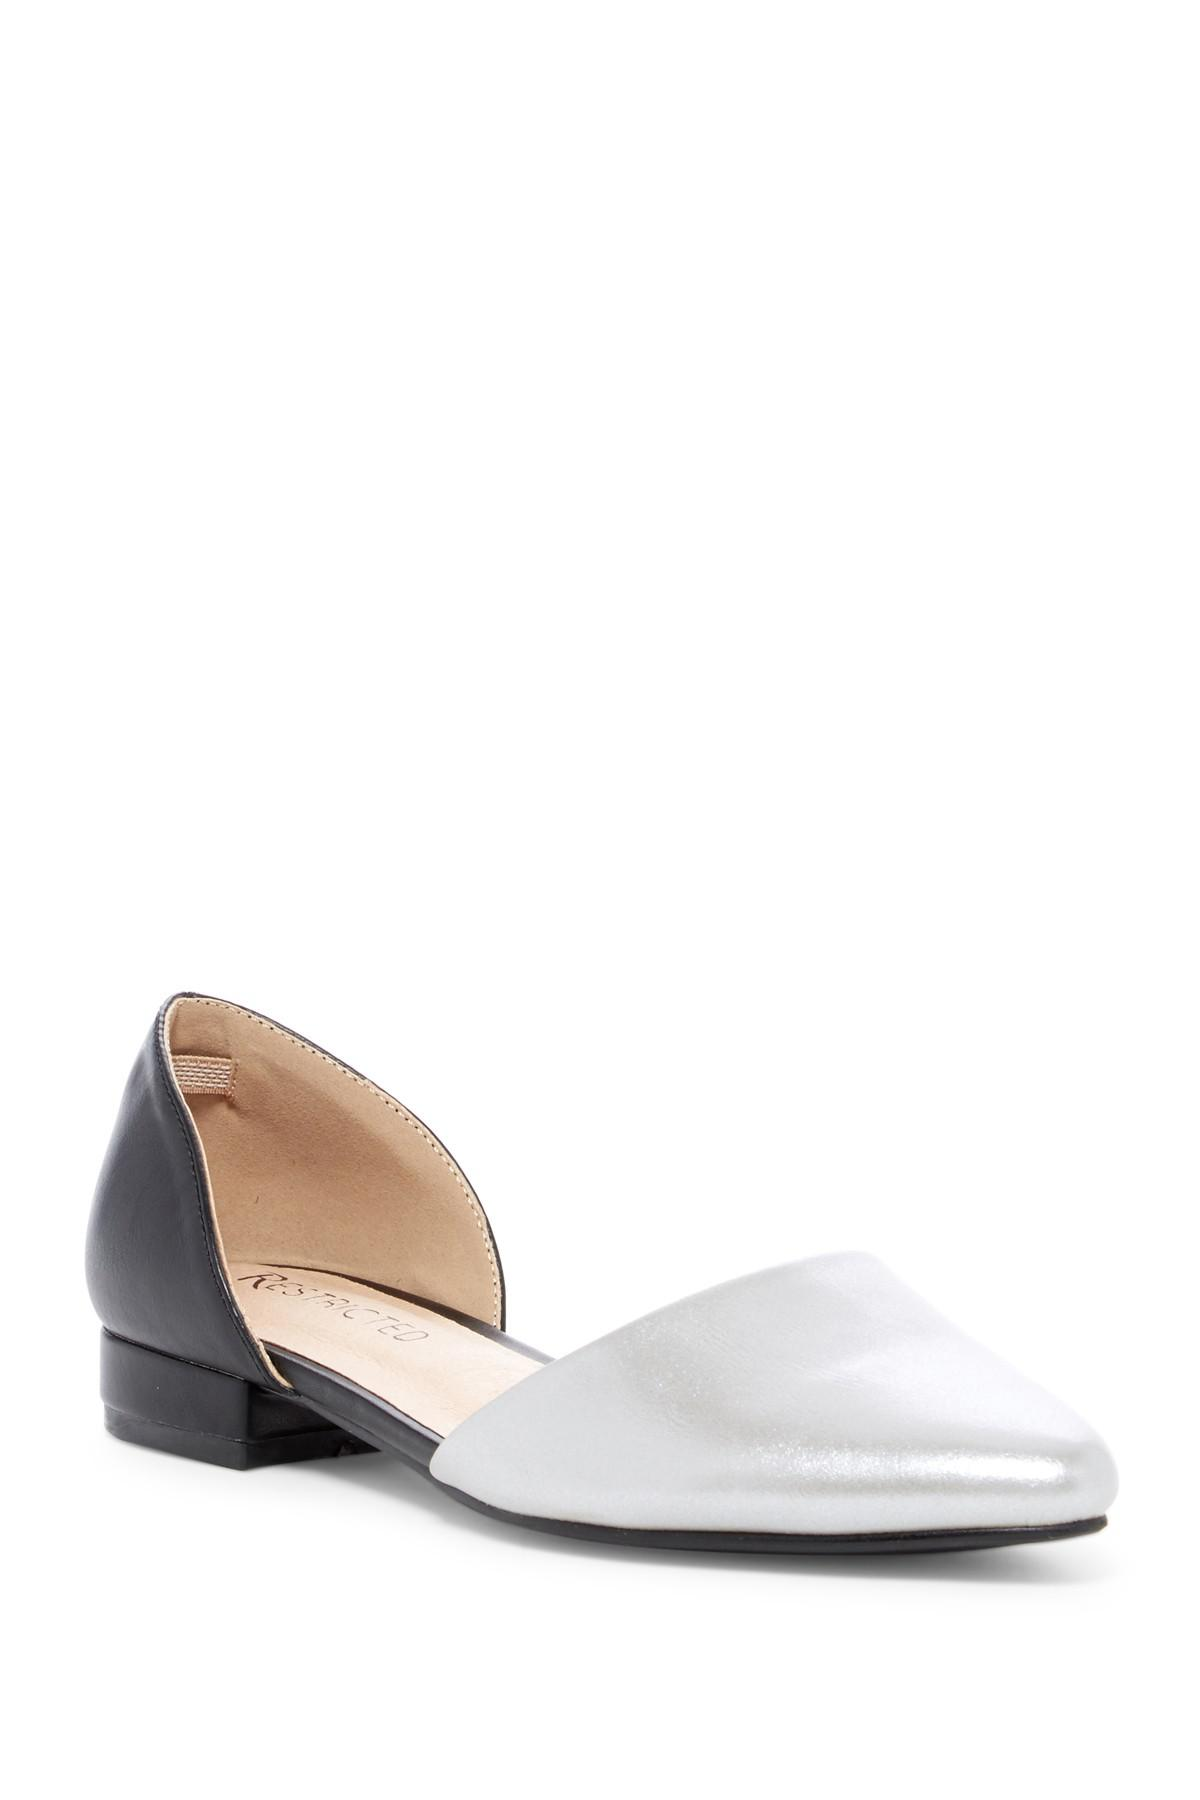 fashionable cheap online Restricted Loyal Metallic D'Orsay Flat cheap sale best sale footaction online rFdIpJBIf